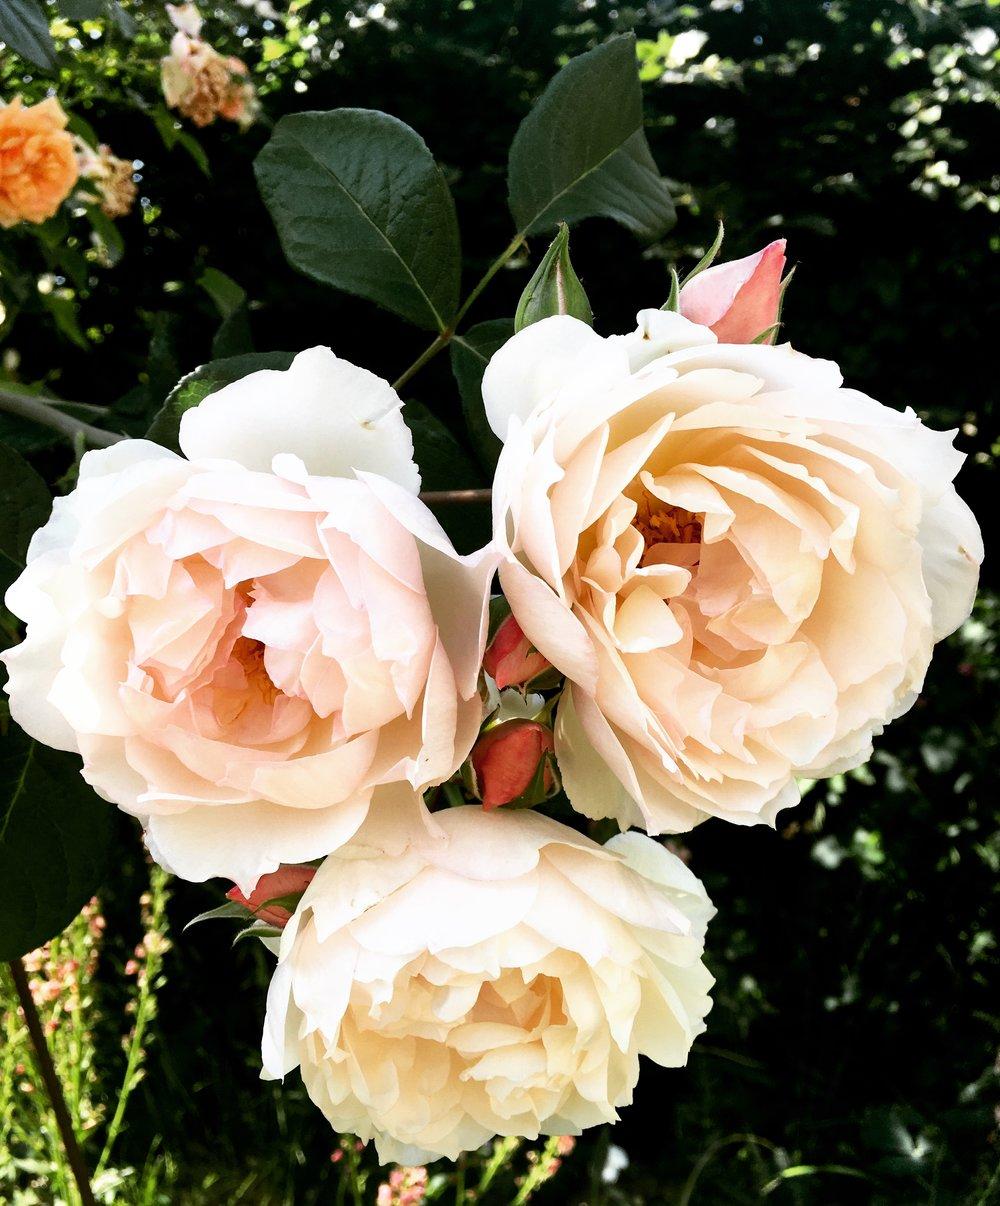 Rose - Generous Gardener